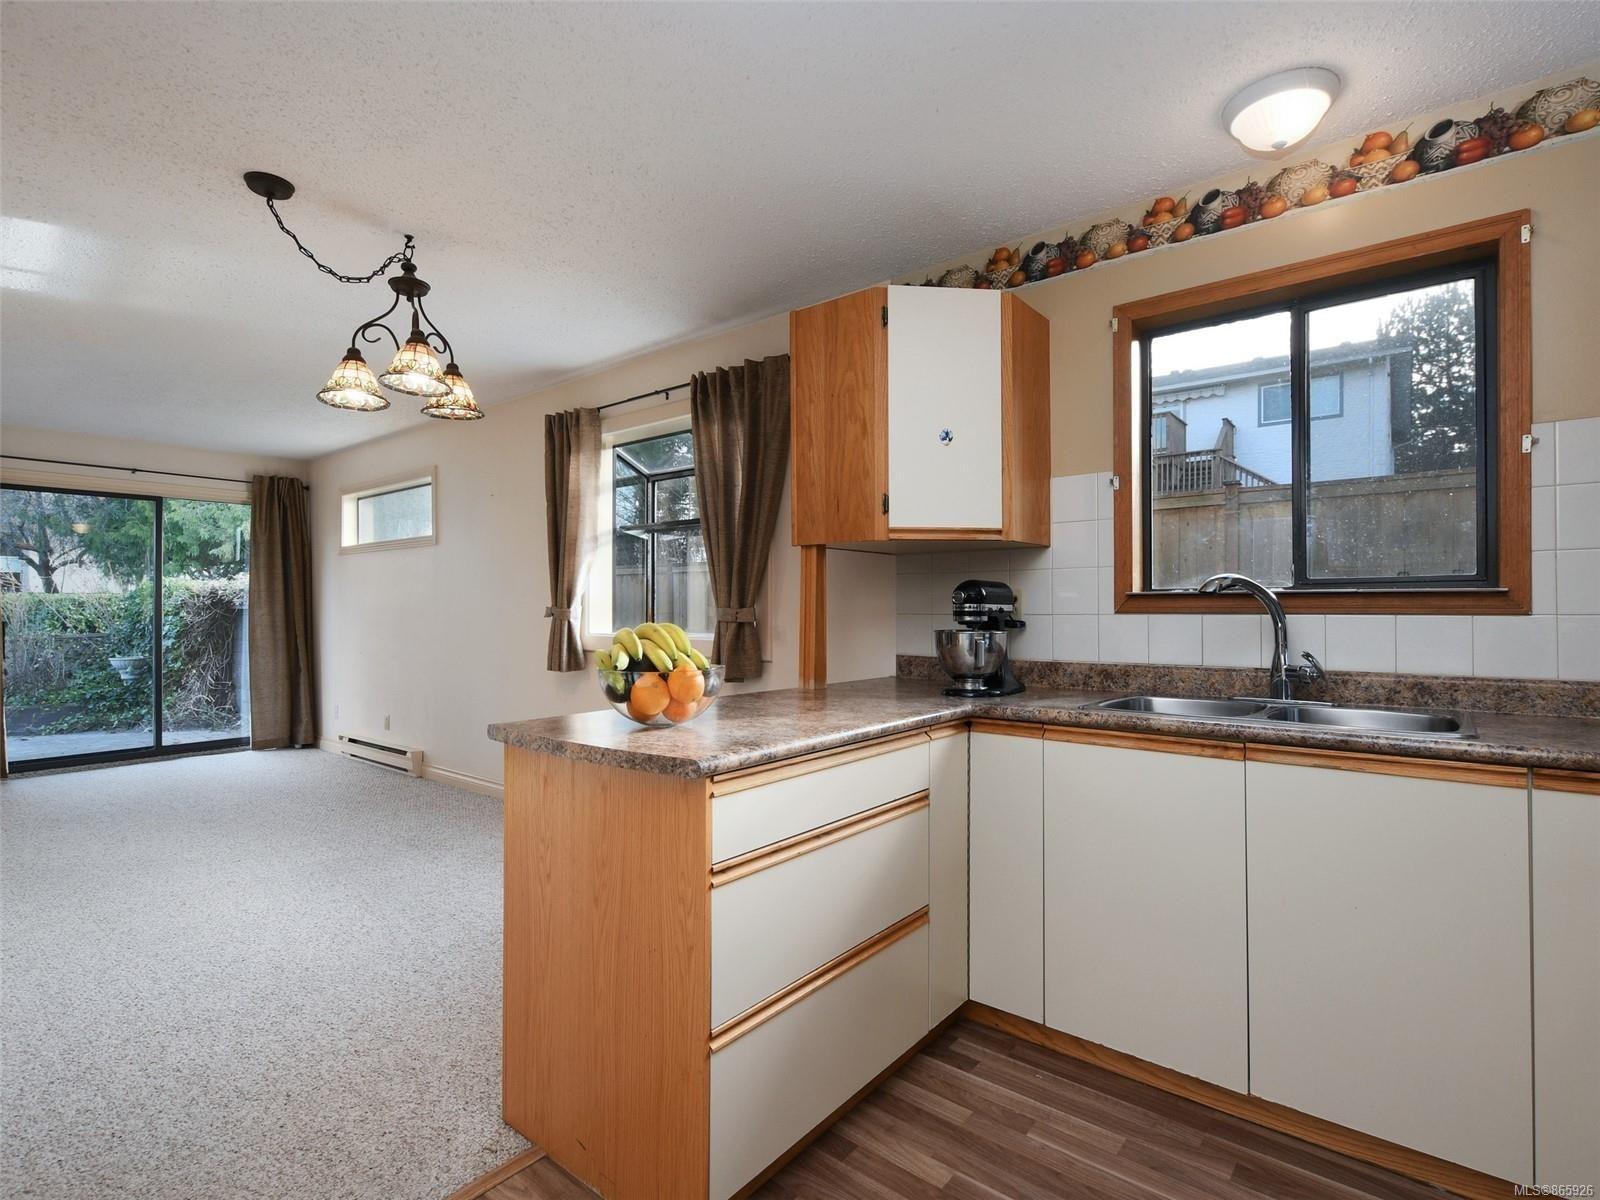 Photo 9: Photos: 8 4350 West Saanich Rd in : SW Royal Oak Row/Townhouse for sale (Saanich West)  : MLS®# 865926